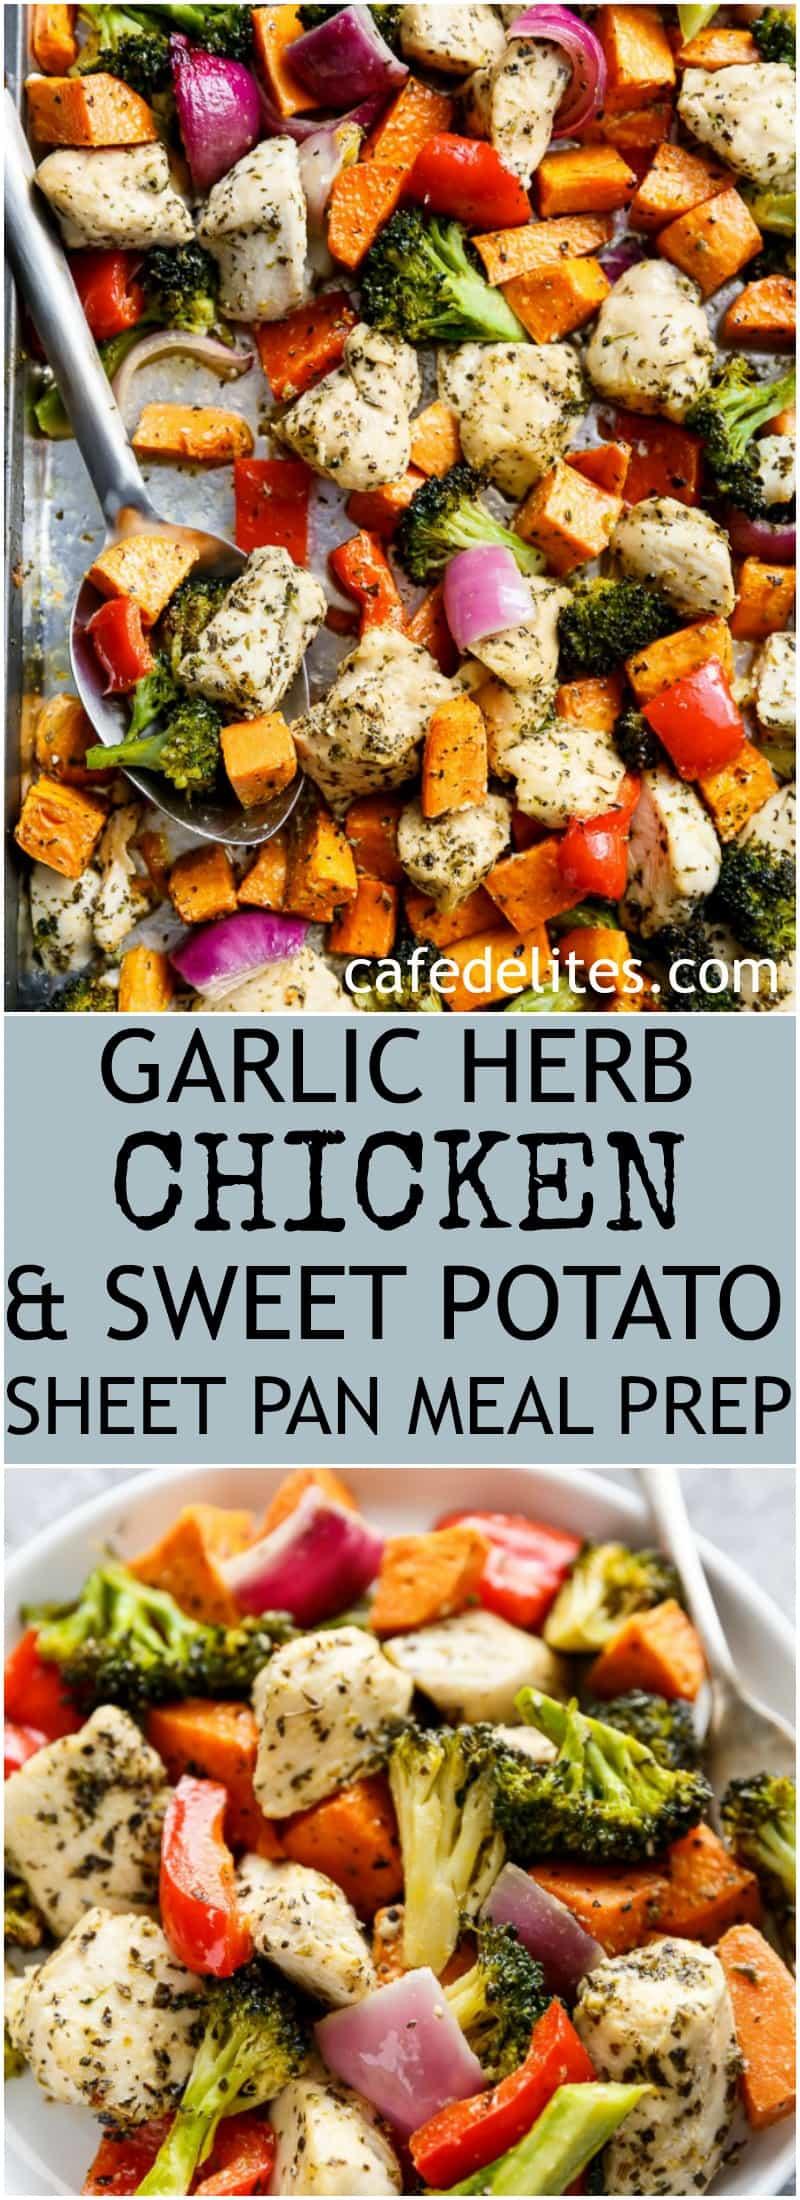 Garlic Herb Chicken & Sweet Potato Sheet Pan Meal Prep - Cafe Delites #onepandinnerschicken